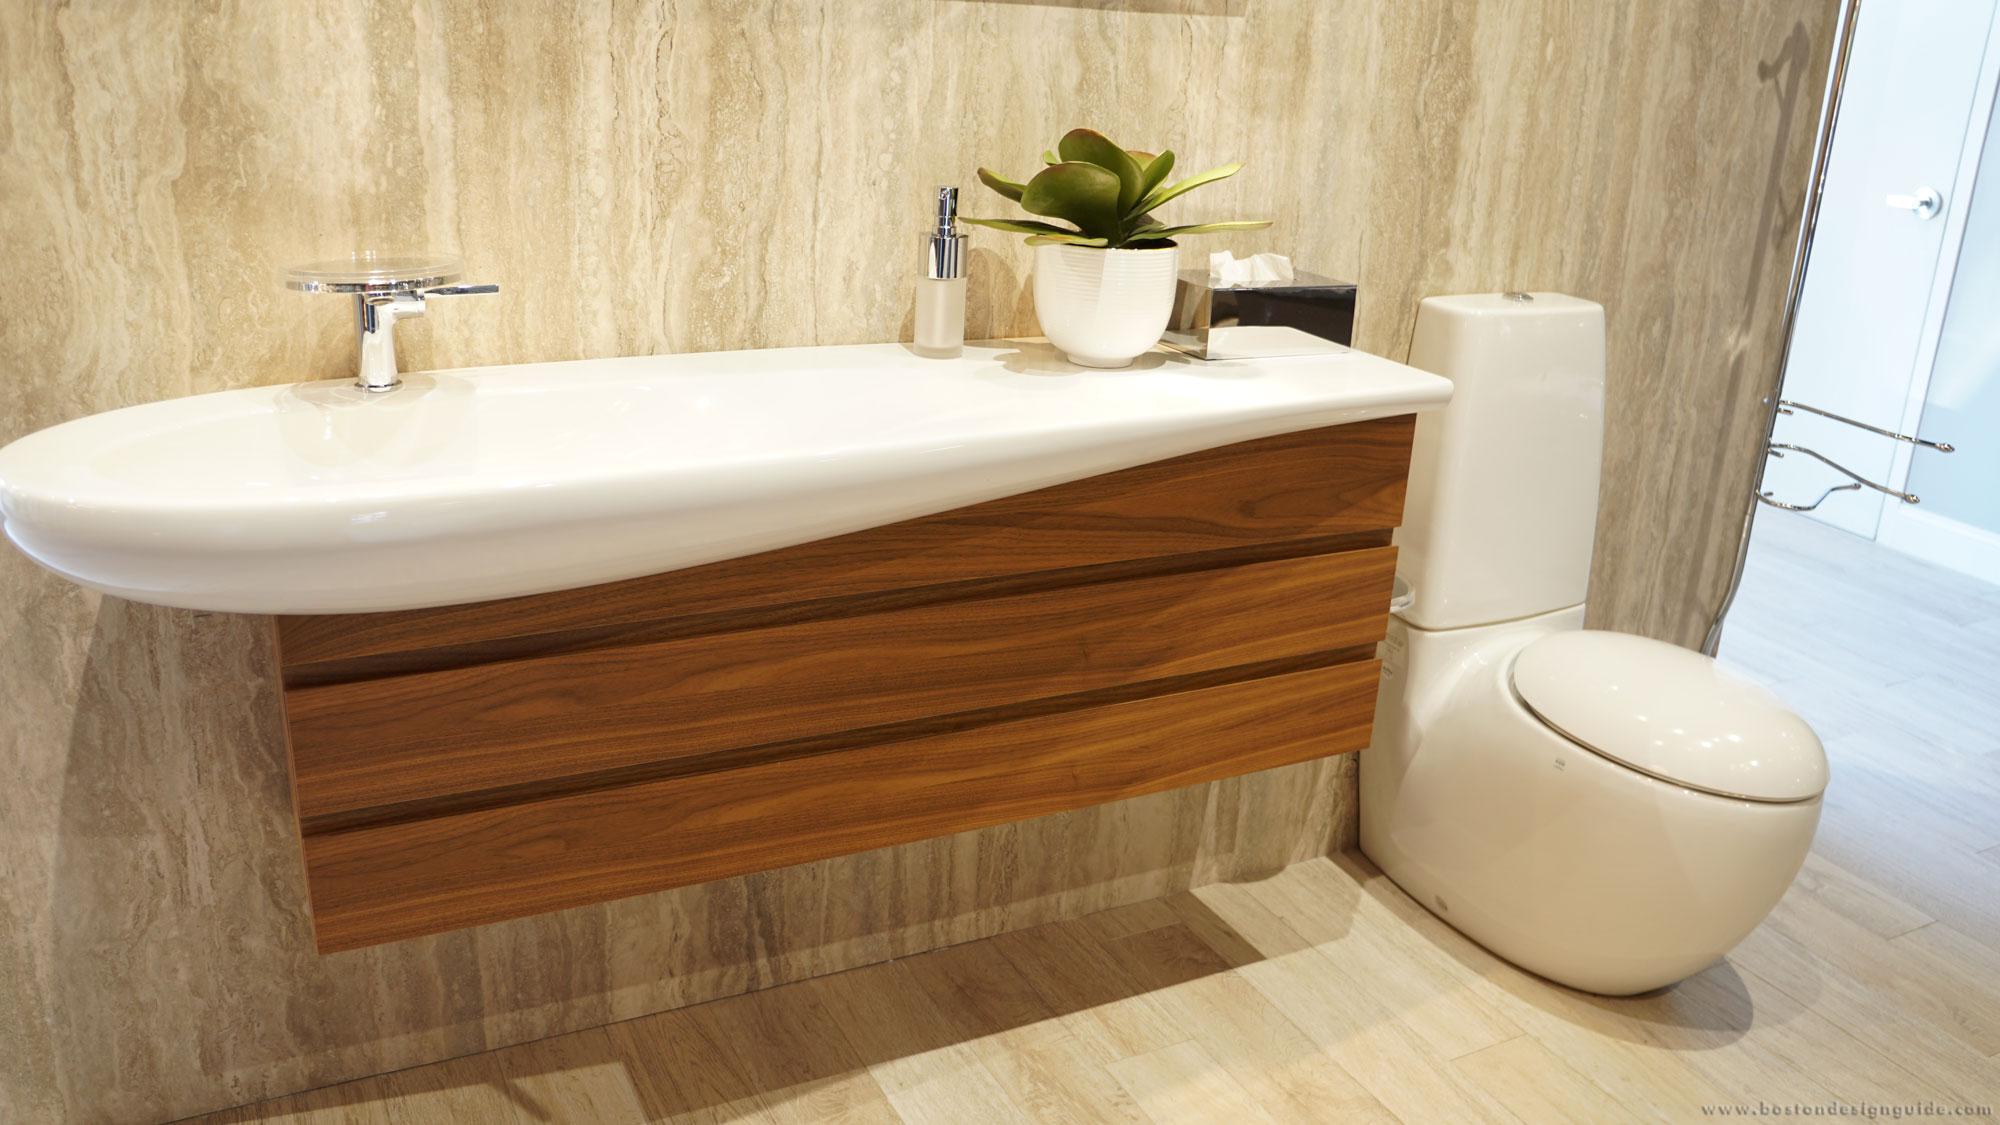 kitchen and bath design center semi custom cabinets splash 244 needham street